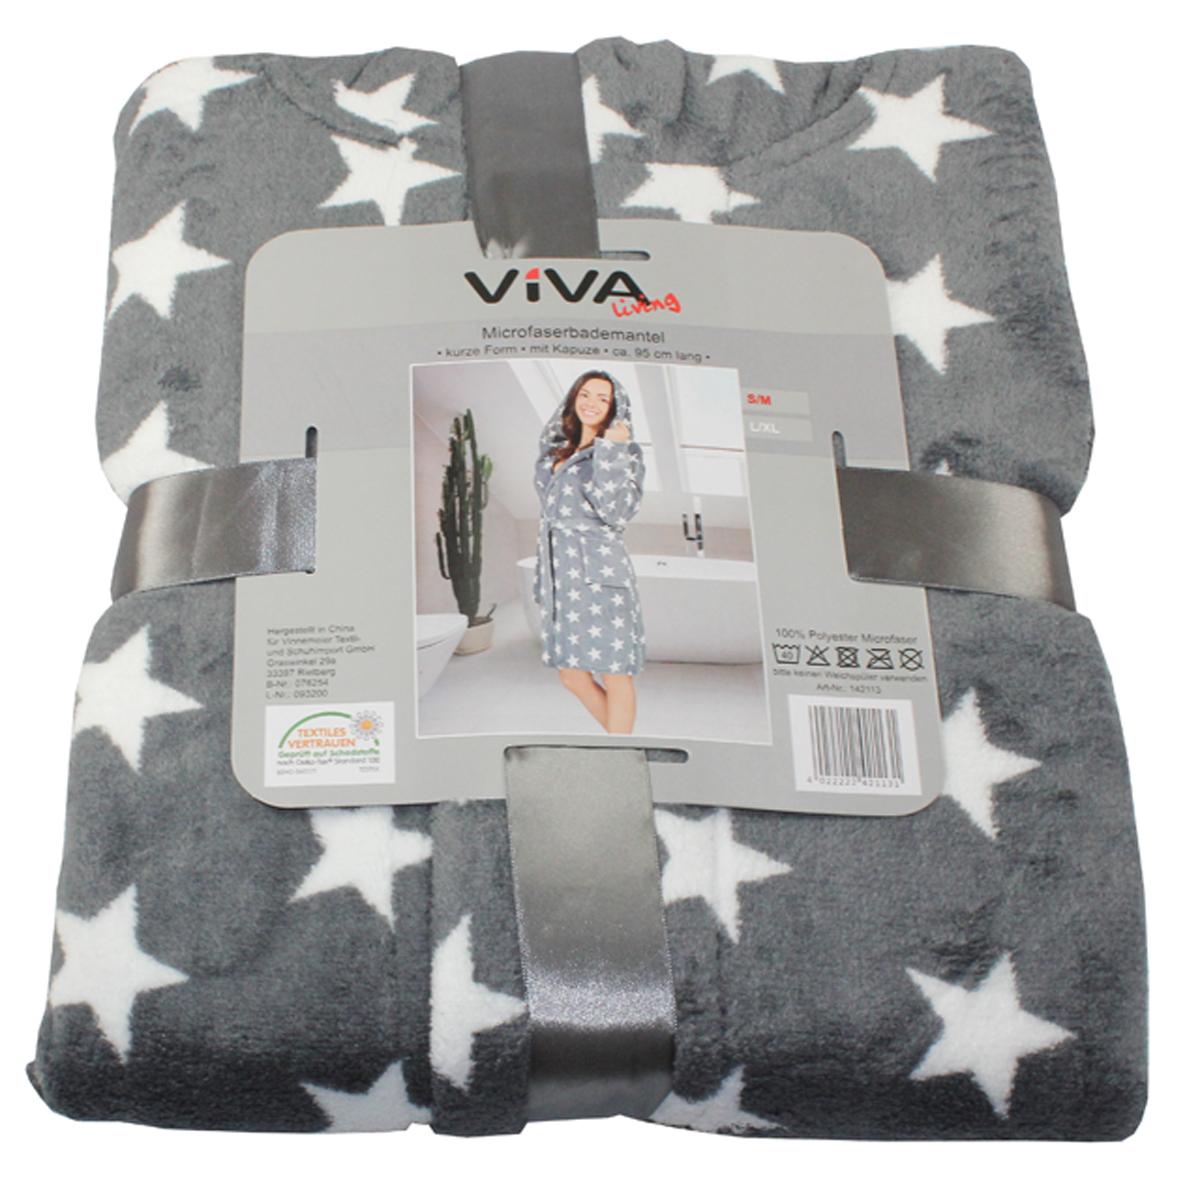 damen microfaser bademantel kurze form sterne s m l xl mit kapuze mantel sauna m bel wohnen. Black Bedroom Furniture Sets. Home Design Ideas